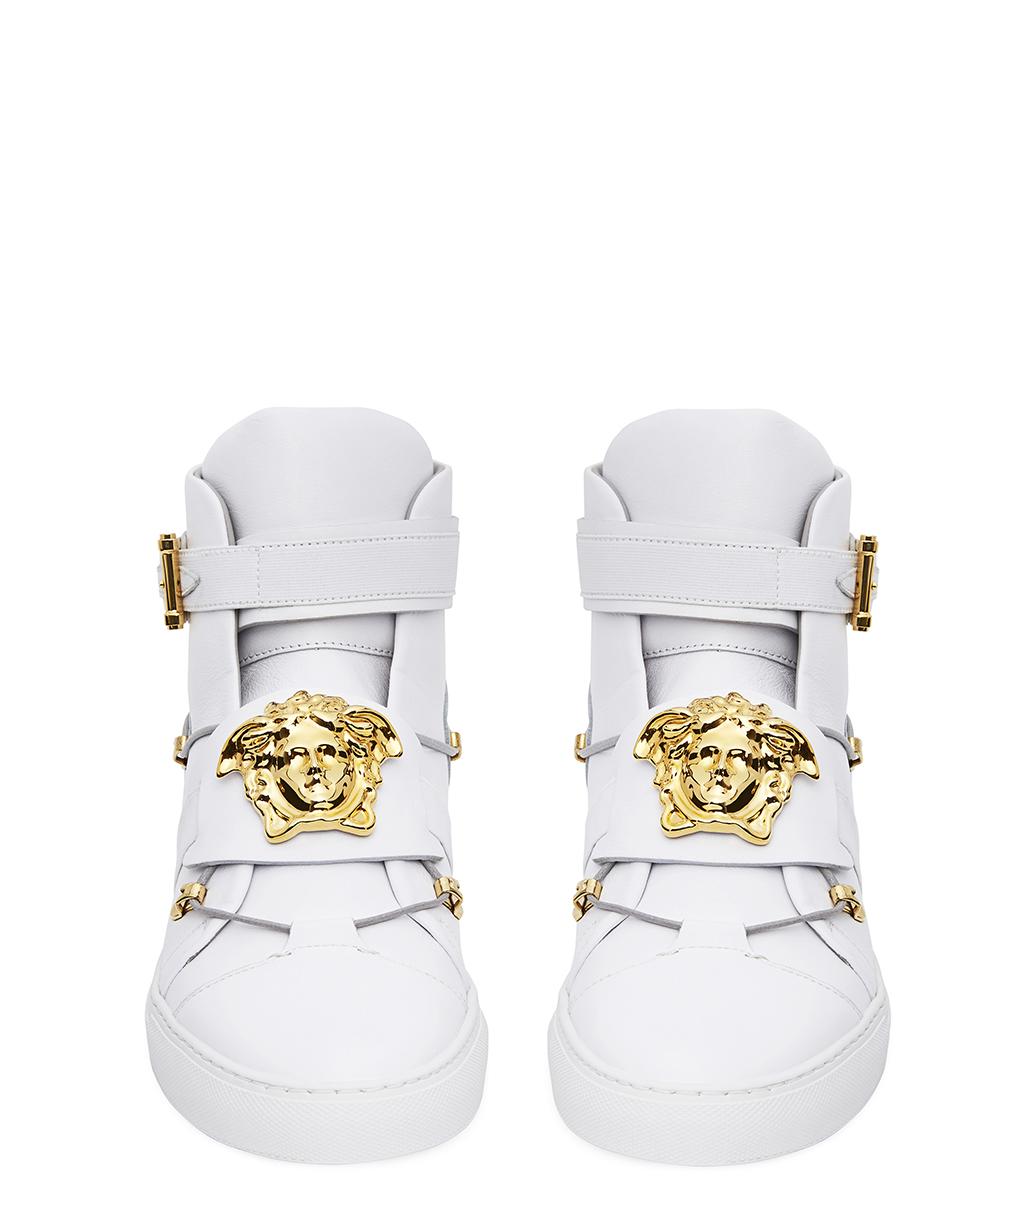 Versace 2015 Spring/Summer Footwear Collection